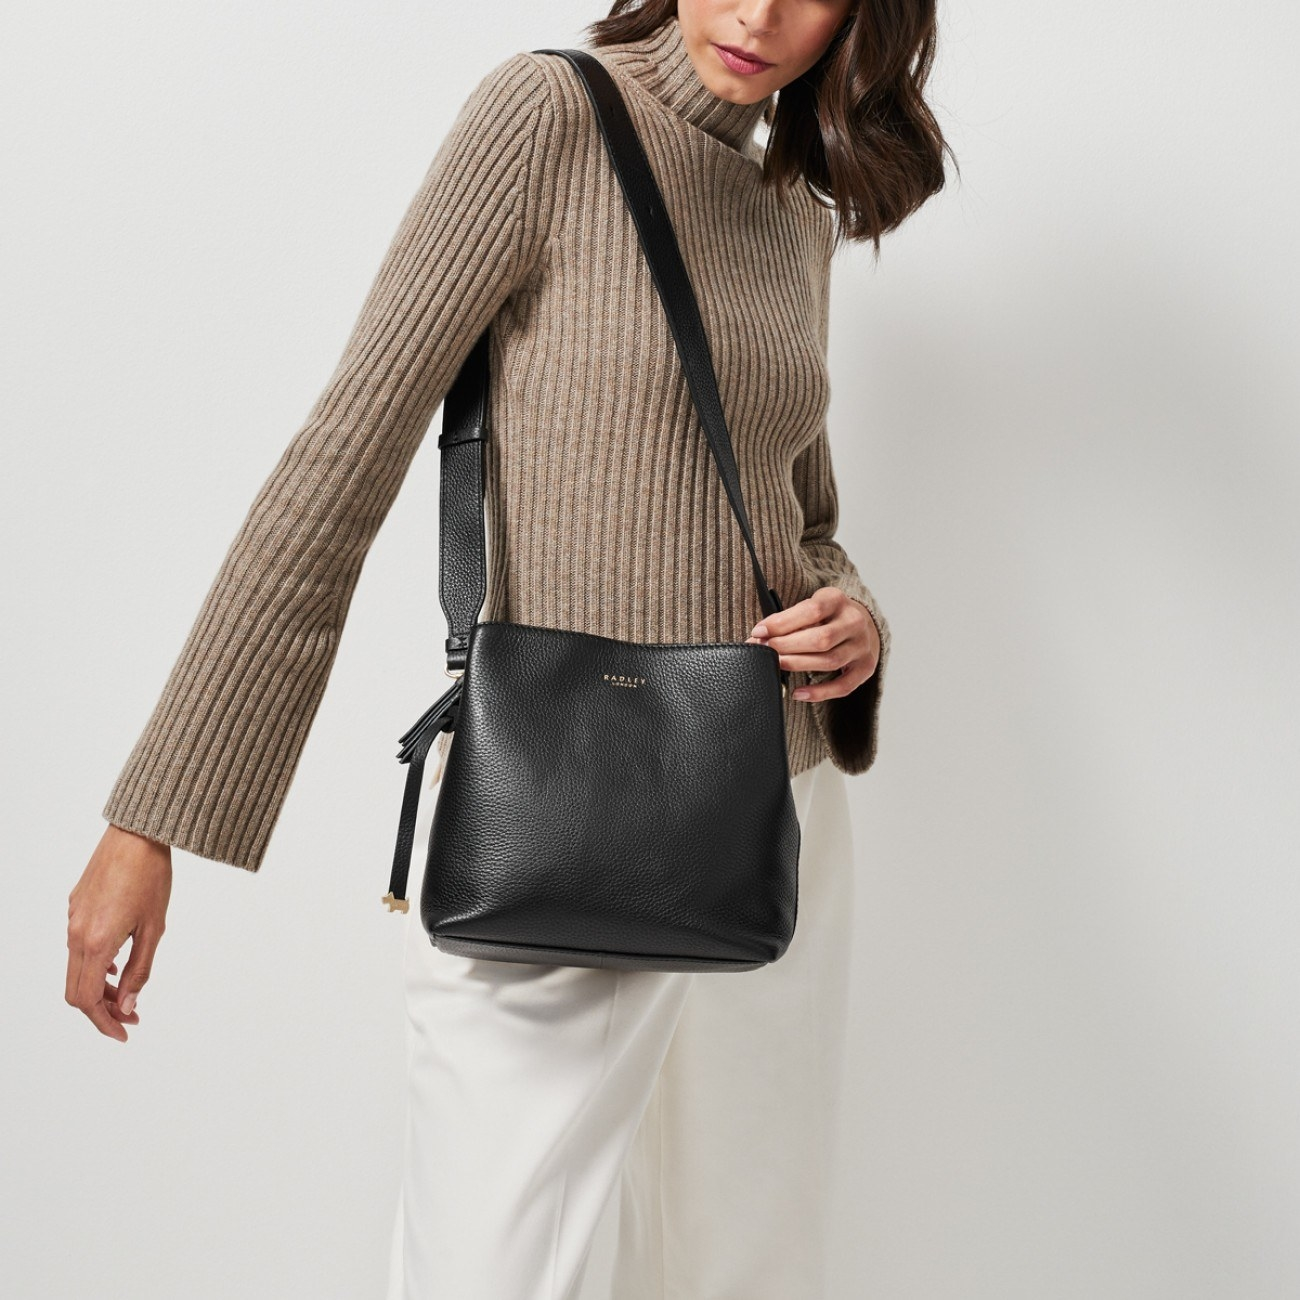 model wearing the crossbody medium-sized bag in black